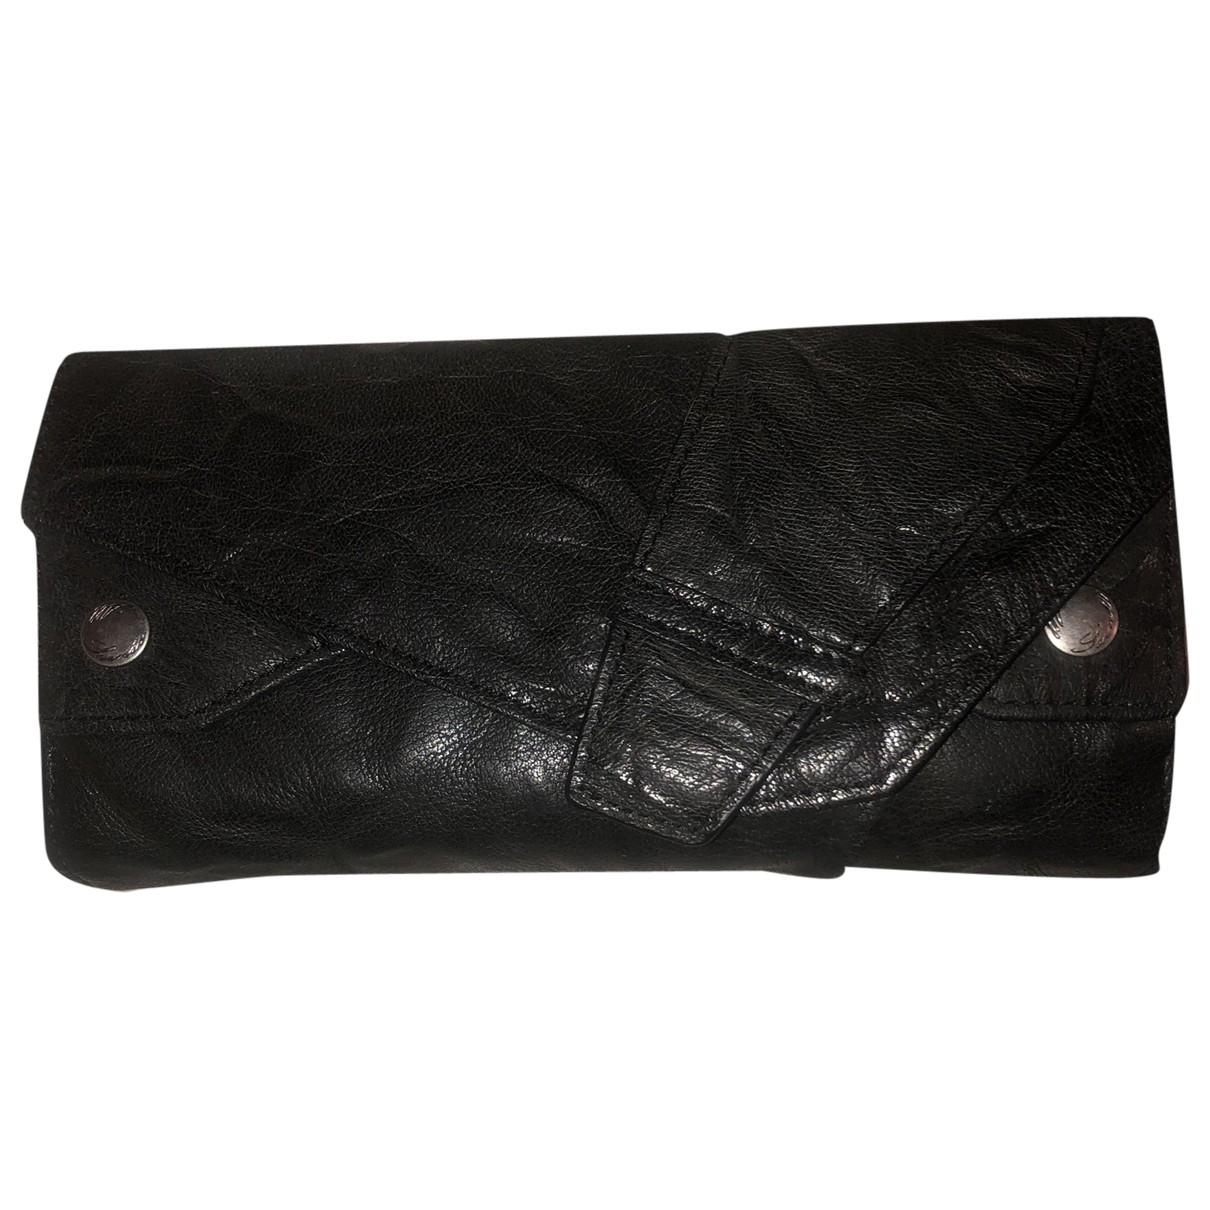 All Saints \N Black Leather wallet for Women \N